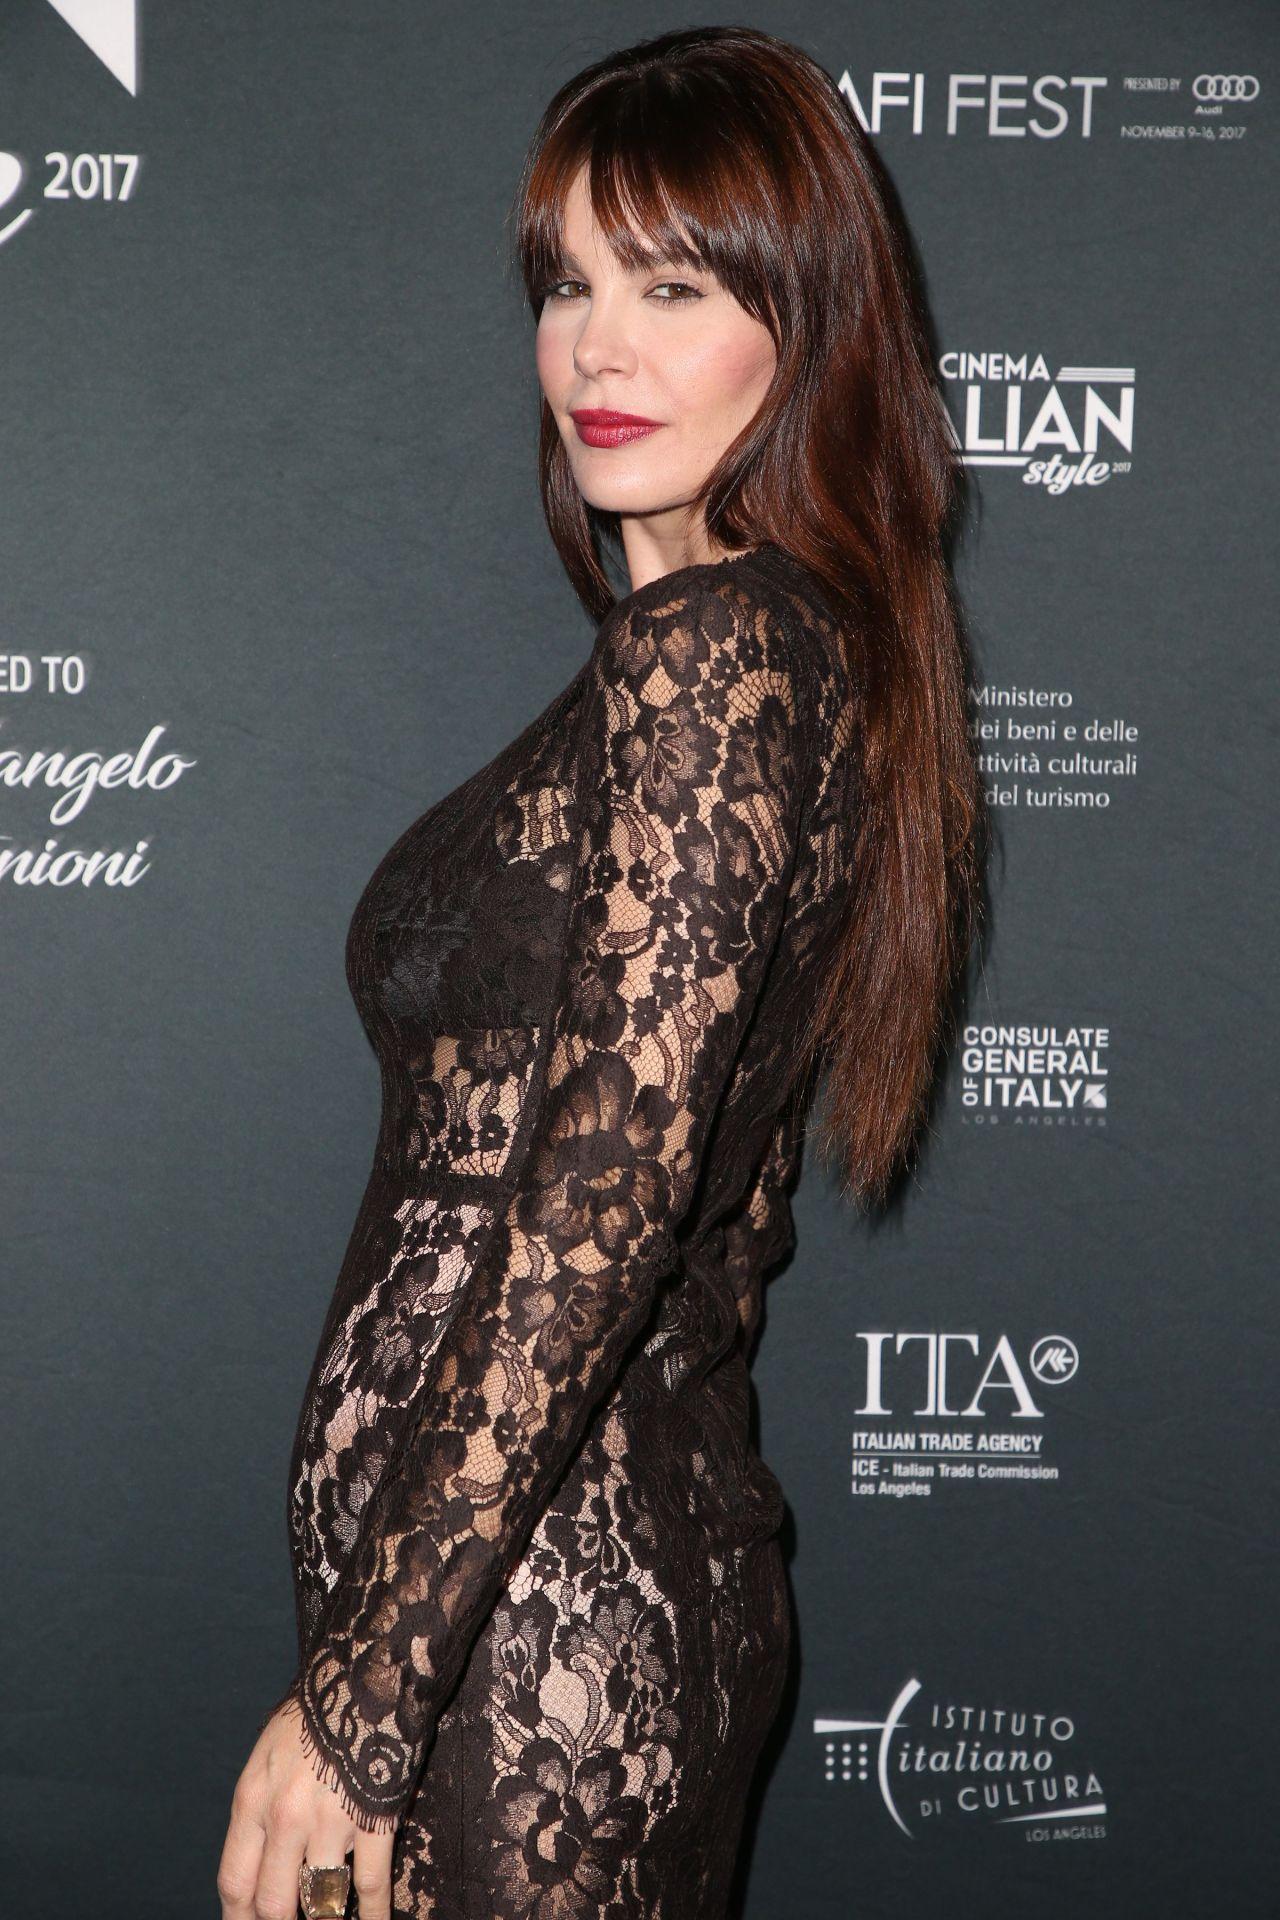 Forum on this topic: Jemma lucy sexy photos 5, luisa-moraes-a-ciambra-screening-cinema-italian/